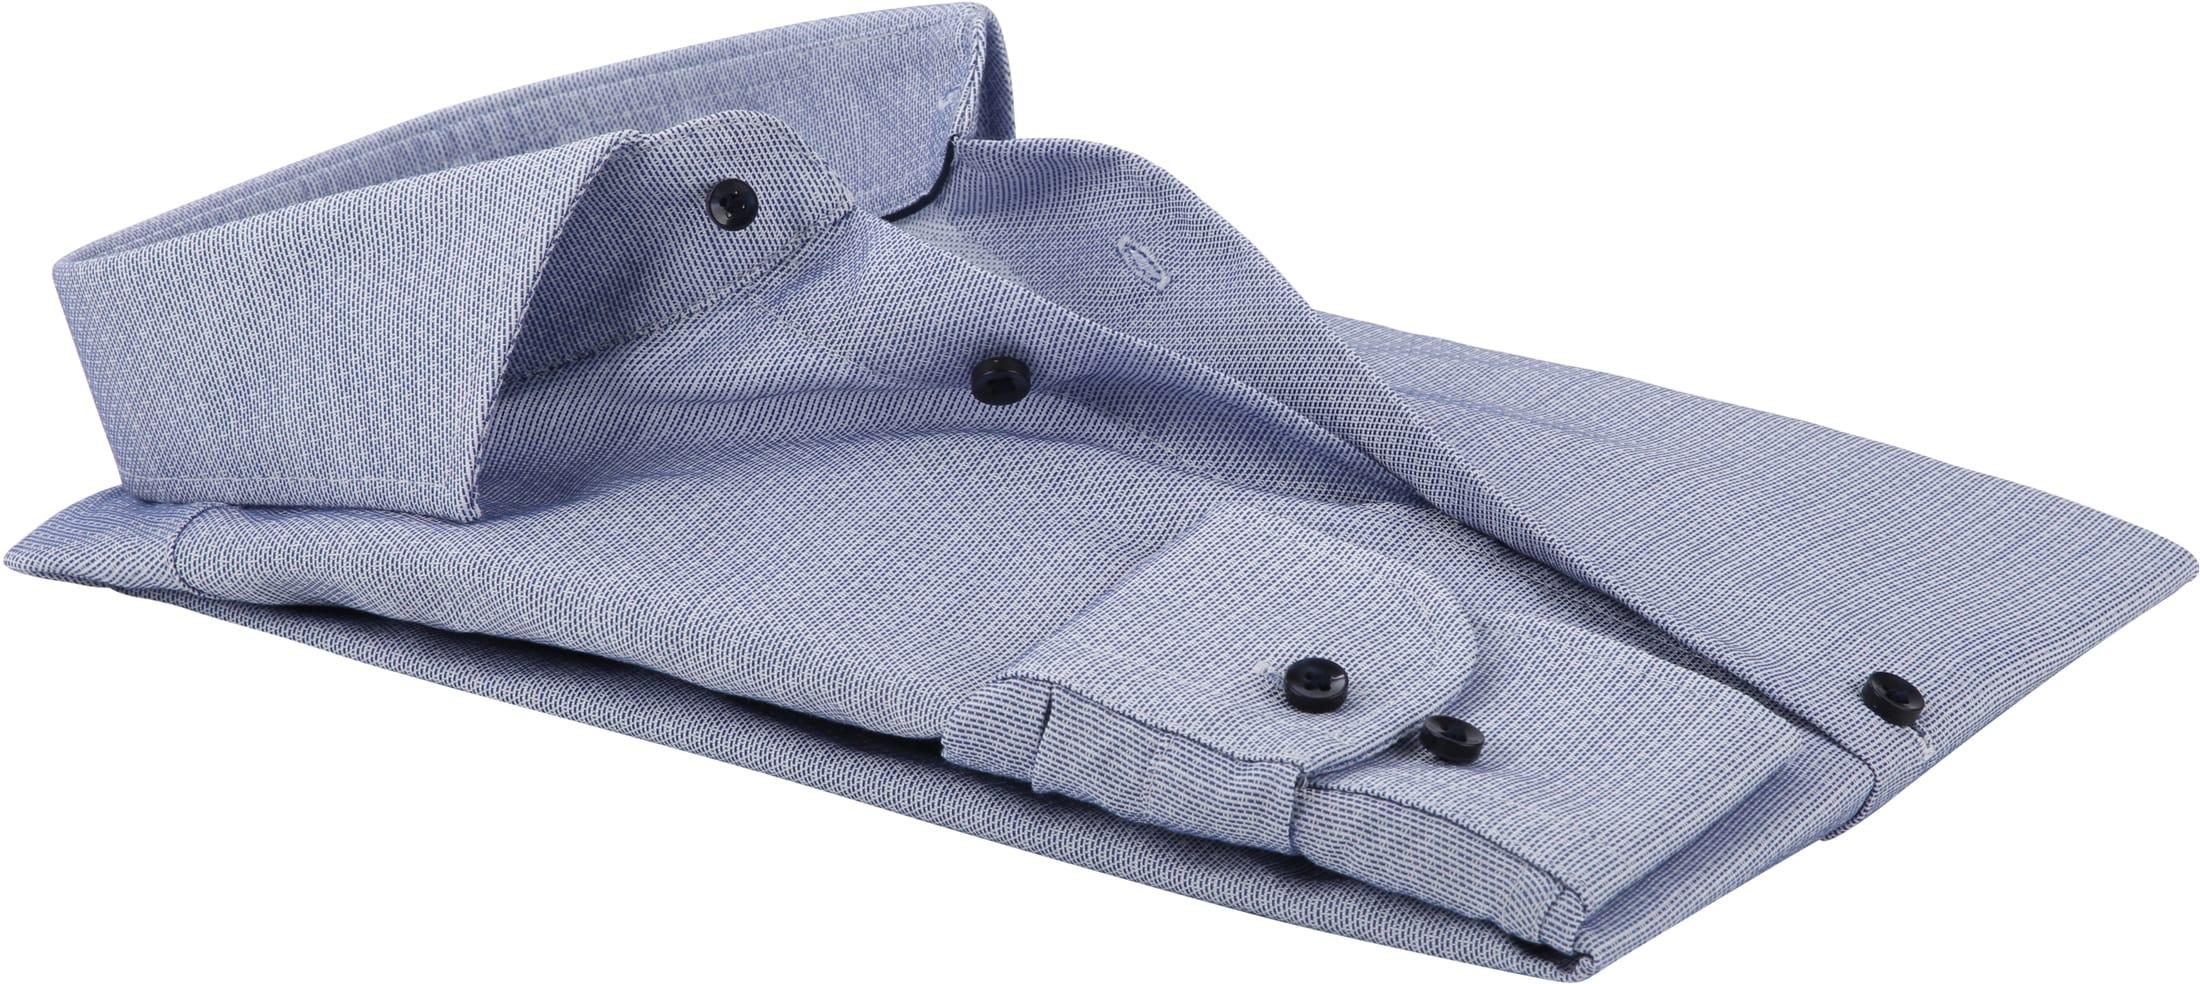 Profuomo Shirt Dobby Blue foto 2